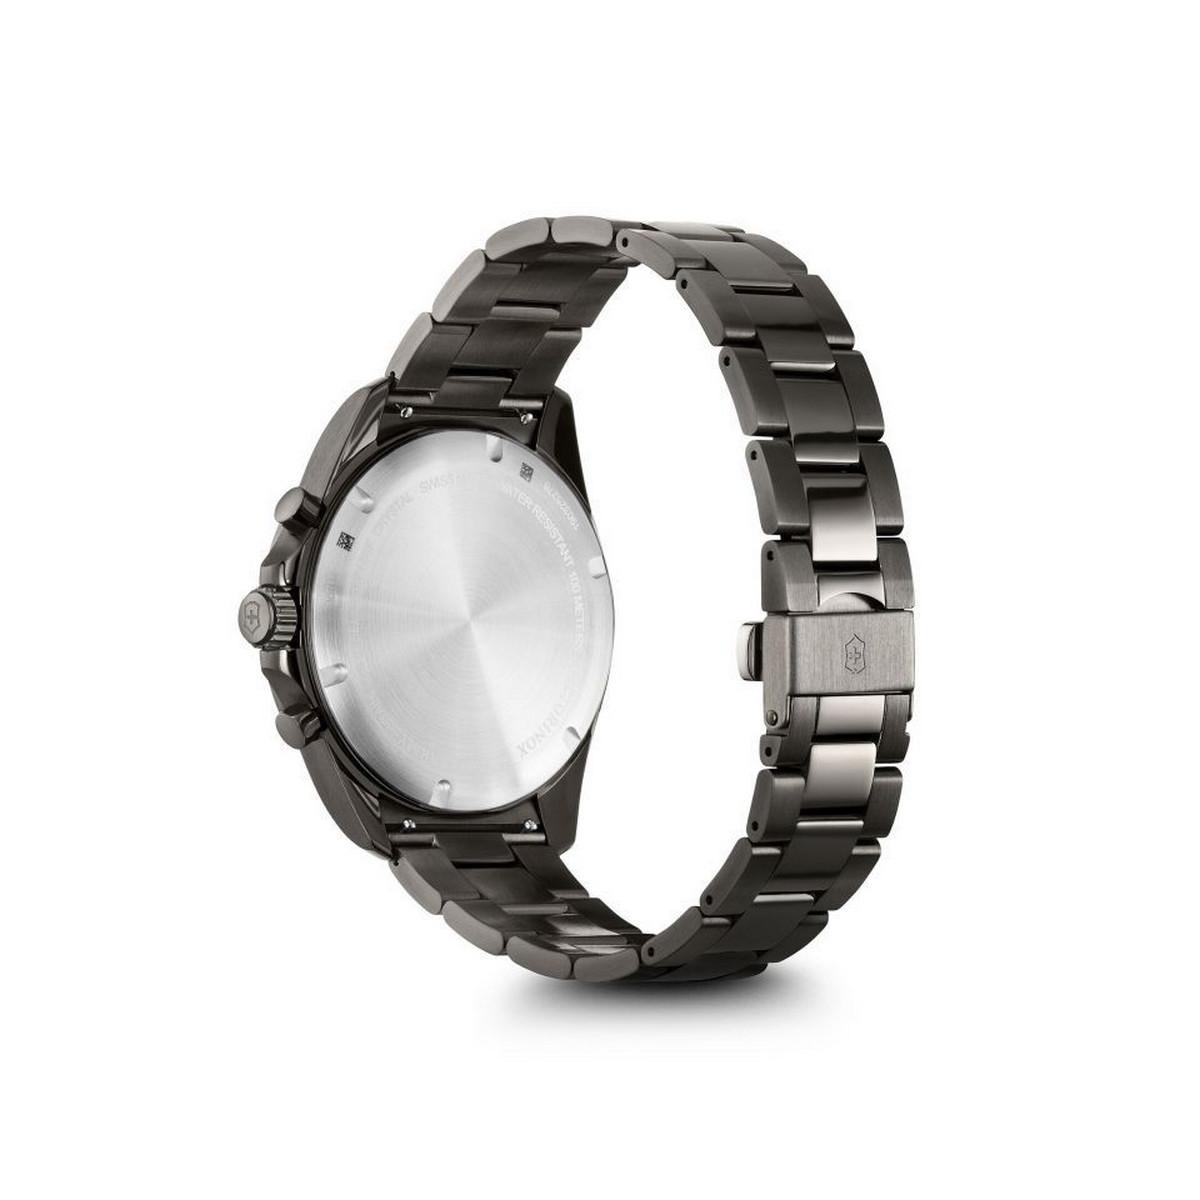 Montre Homme Victorinox FIELDFORCE Sport Chrono, cadran noir, bracelet acier inoxydable noir - 42 mm